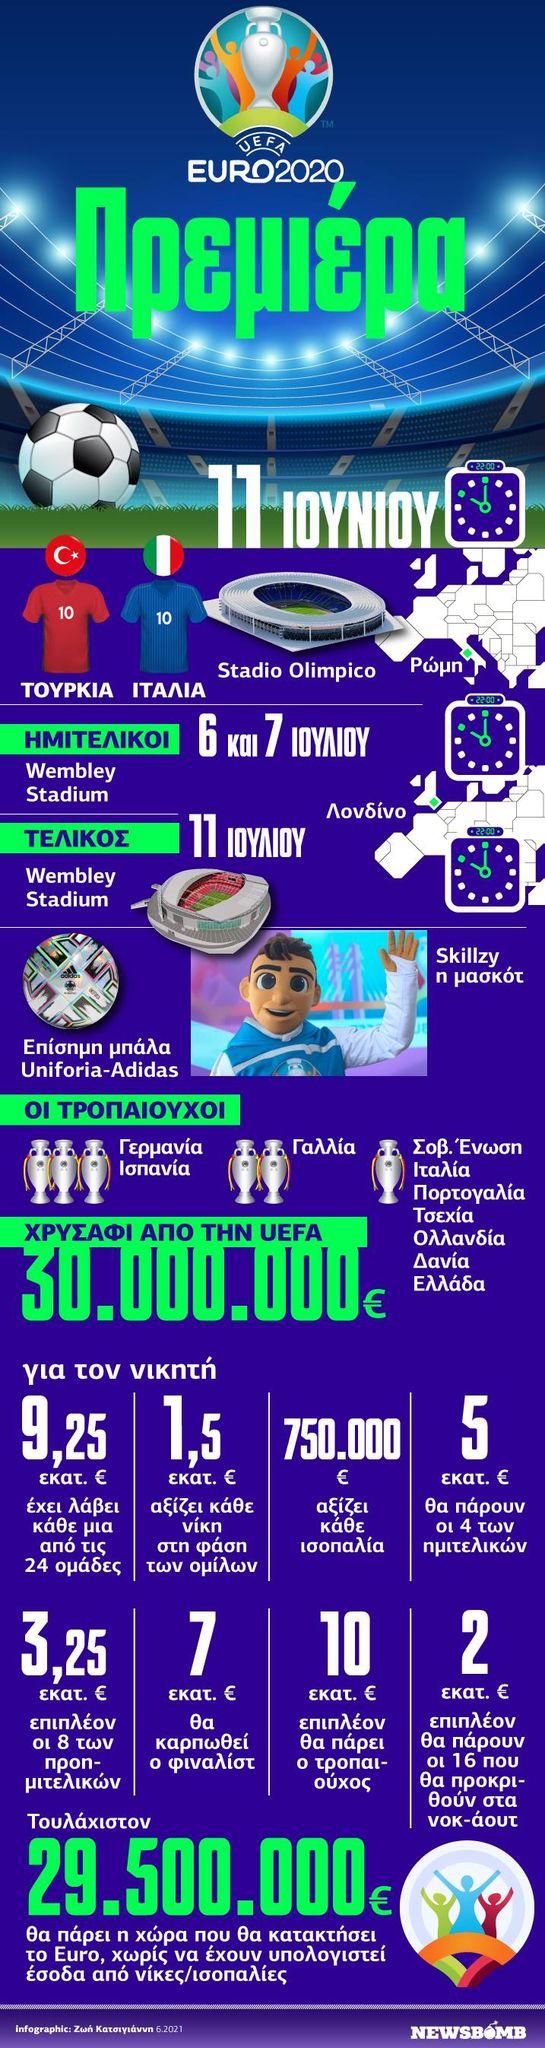 Infopgraphic